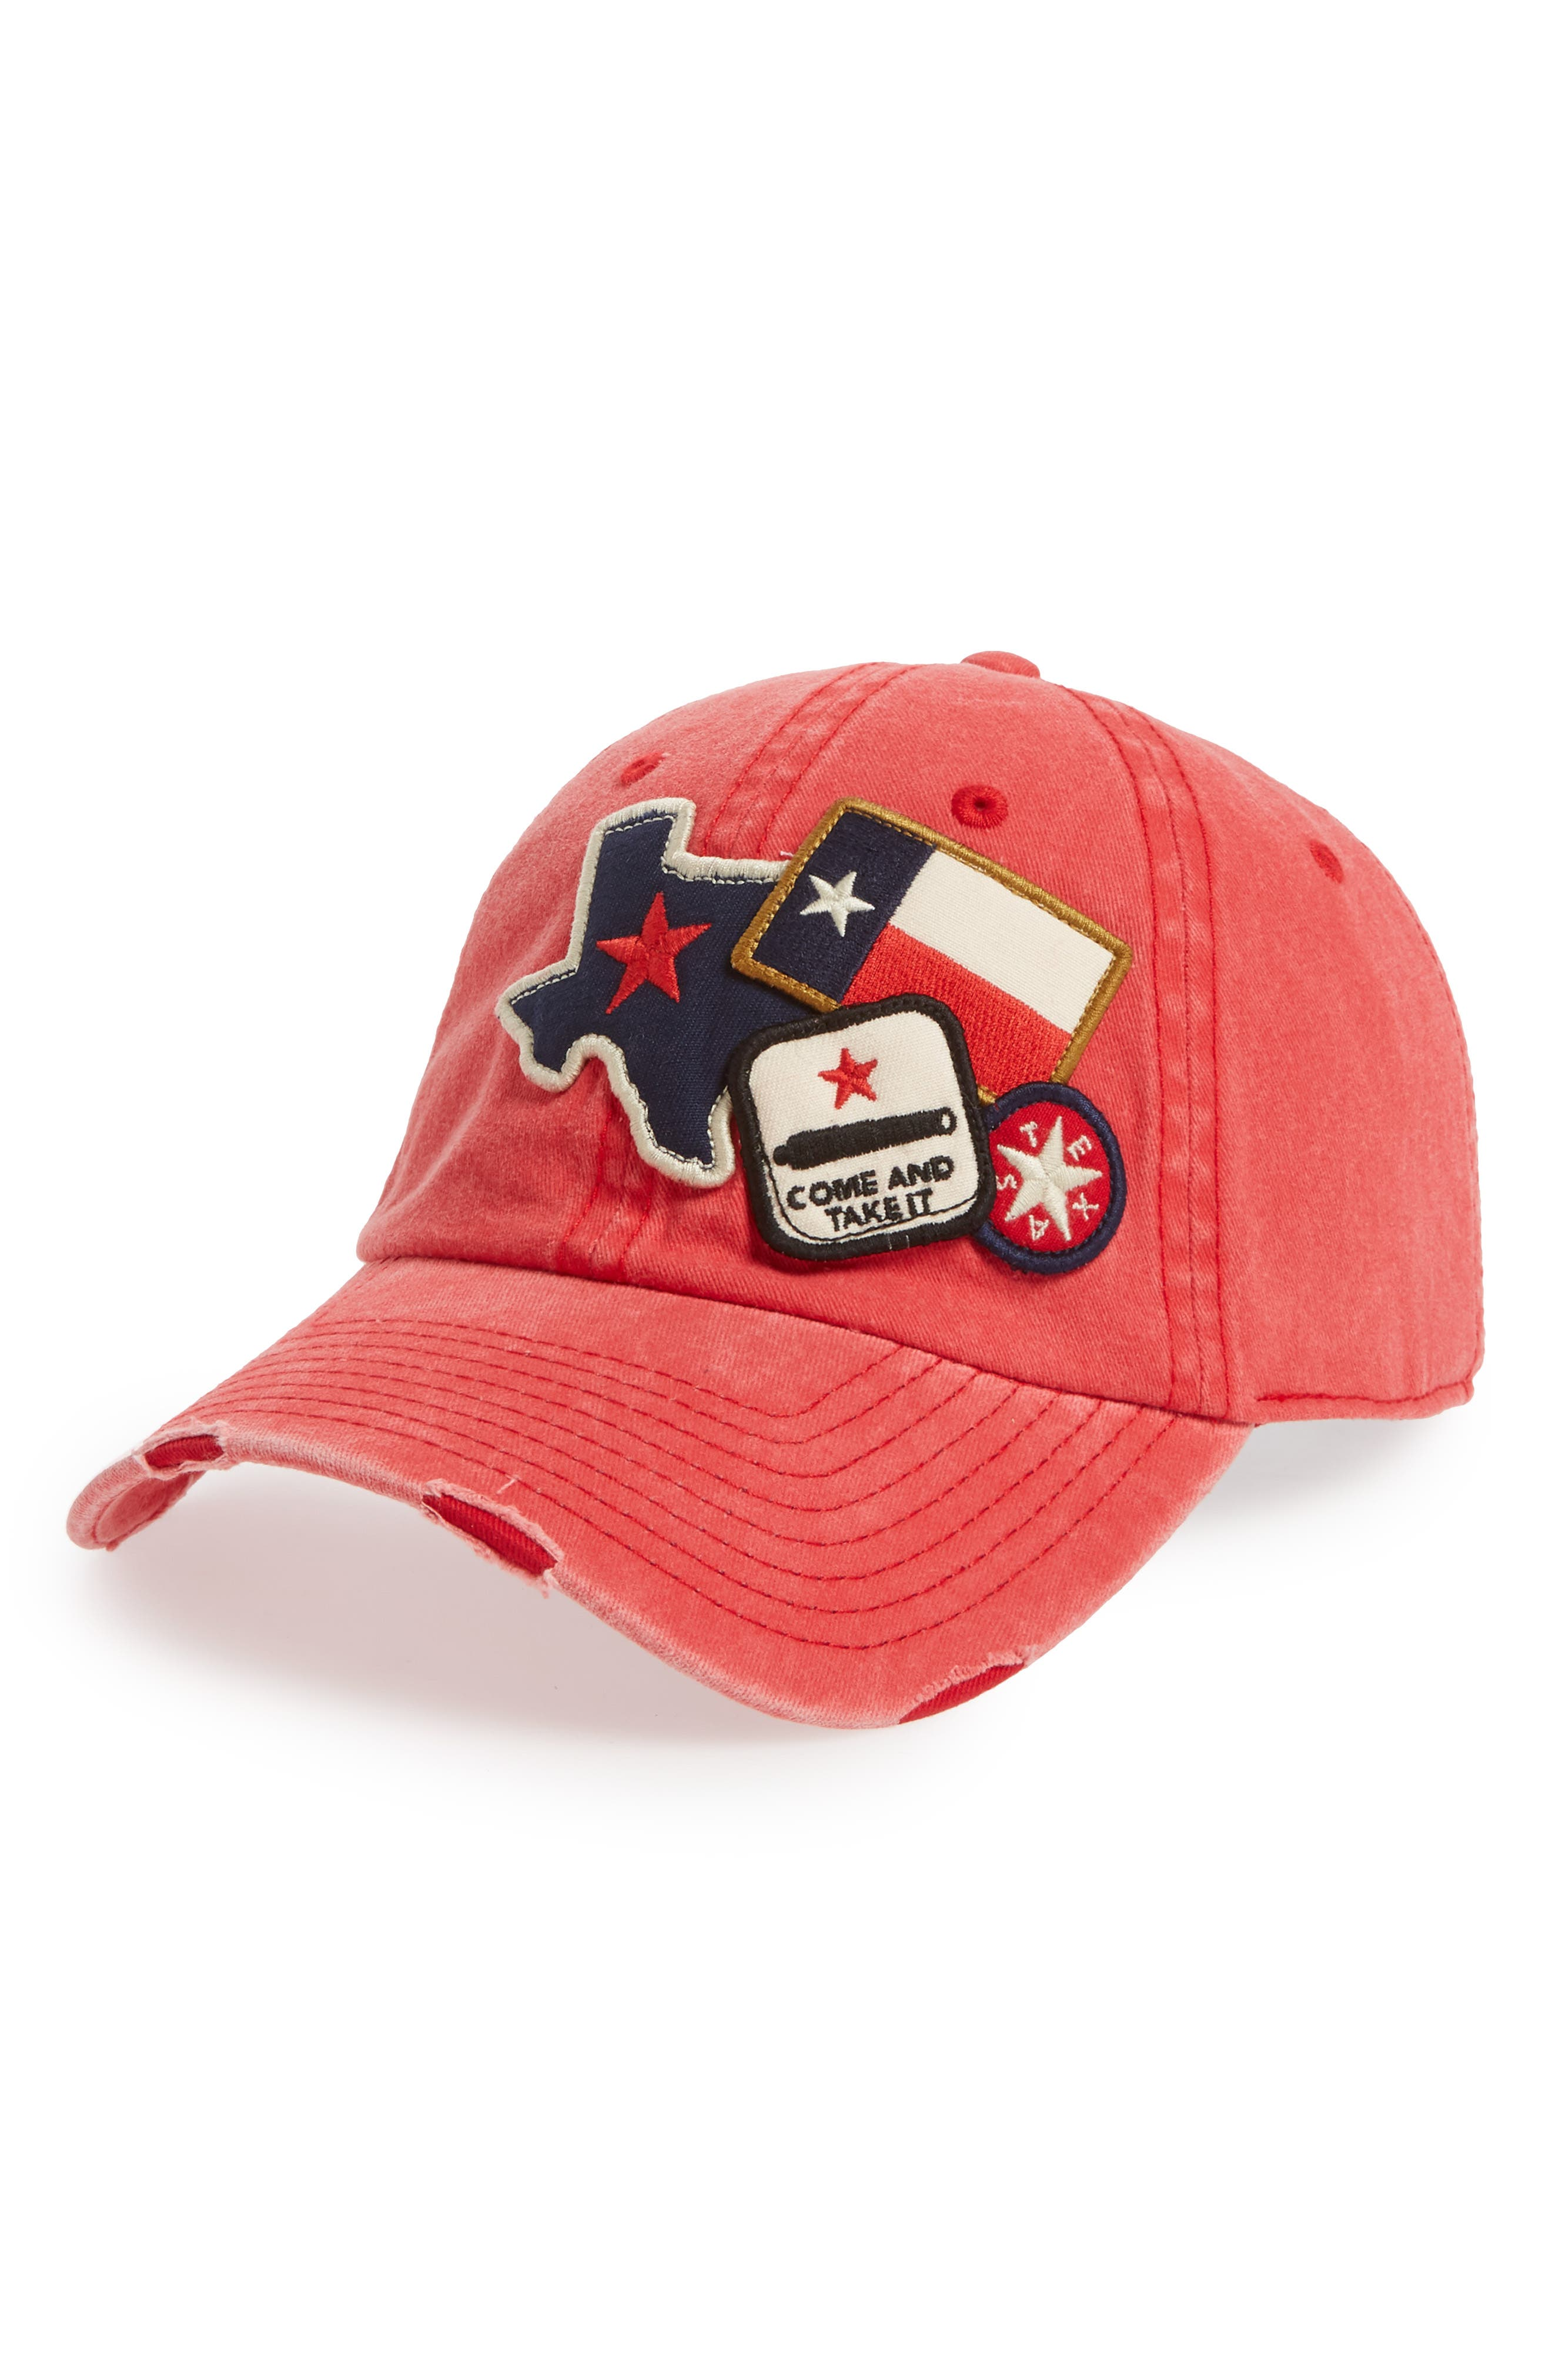 Iconic - Texas Ball Cap,                             Main thumbnail 1, color,                             600